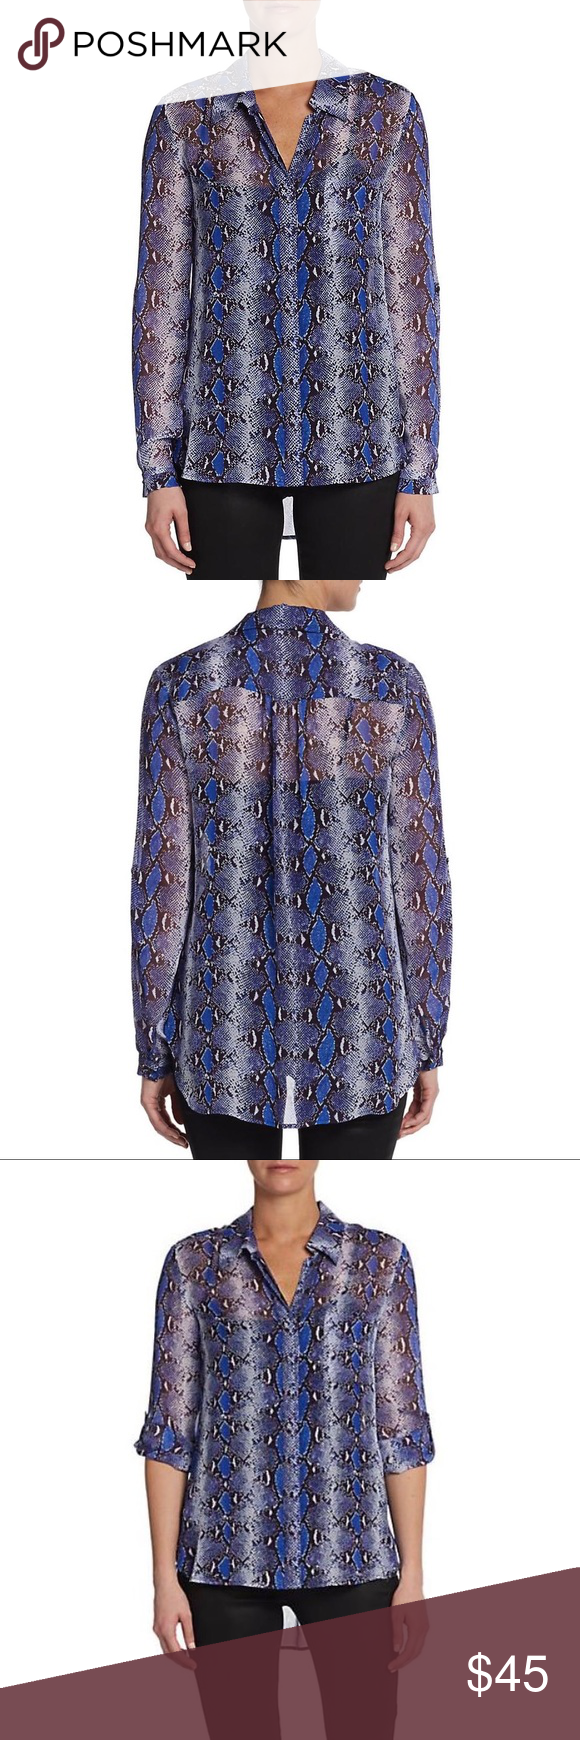 315b145b01624c DVF - Lorelei Snake Silk Long Sleeve Blouse 10   M DIANE VON FURSTENBERG  Blue Python Print  Lorelei  Button Up Long Sleeve Sheer Silk Blouse Size 10  ...